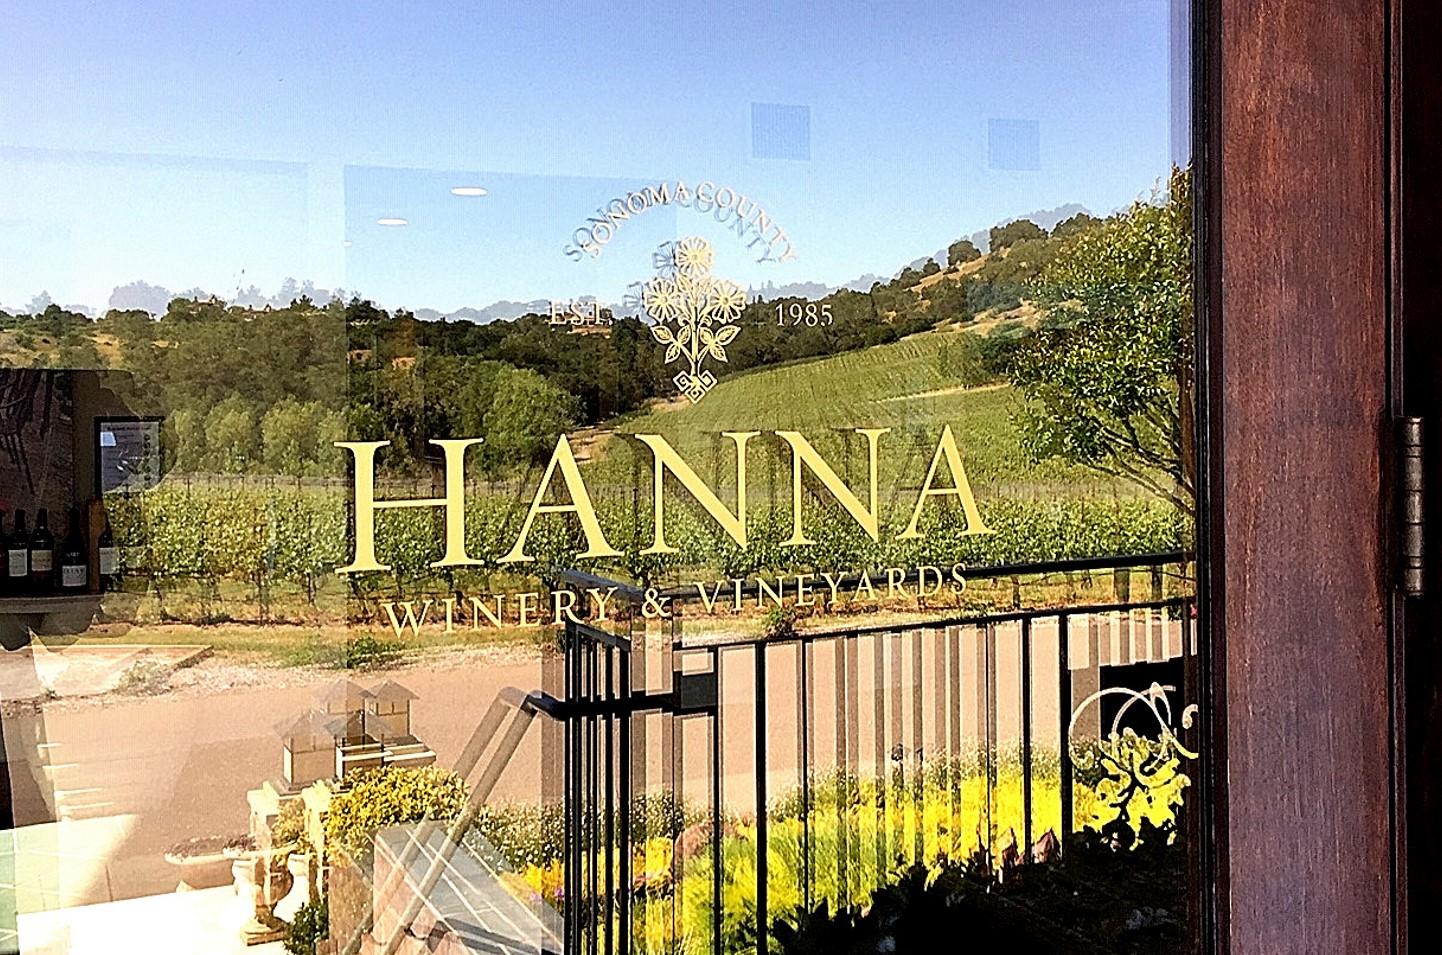 Hanna Winery tasting room reflection on main entrance door